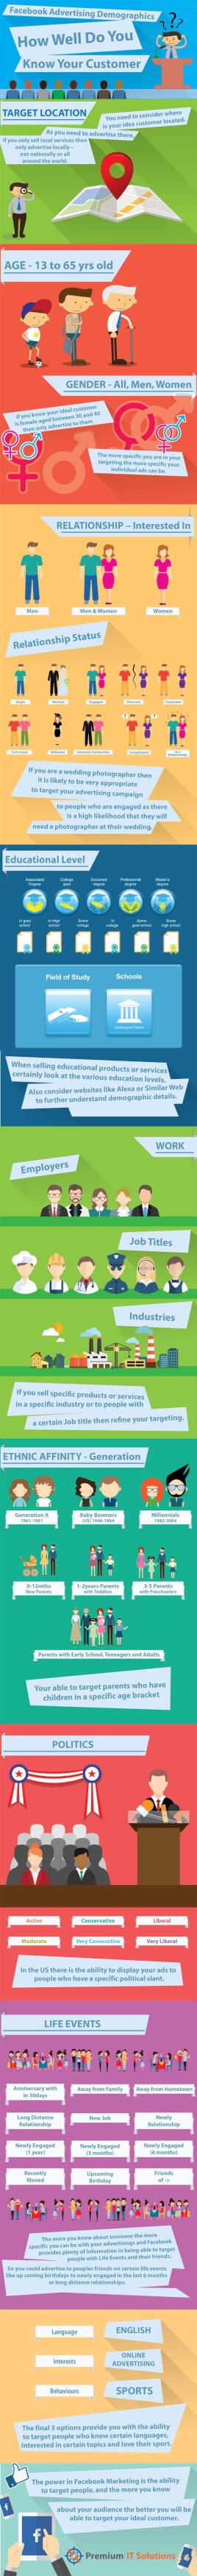 facebook-advertising-infographic